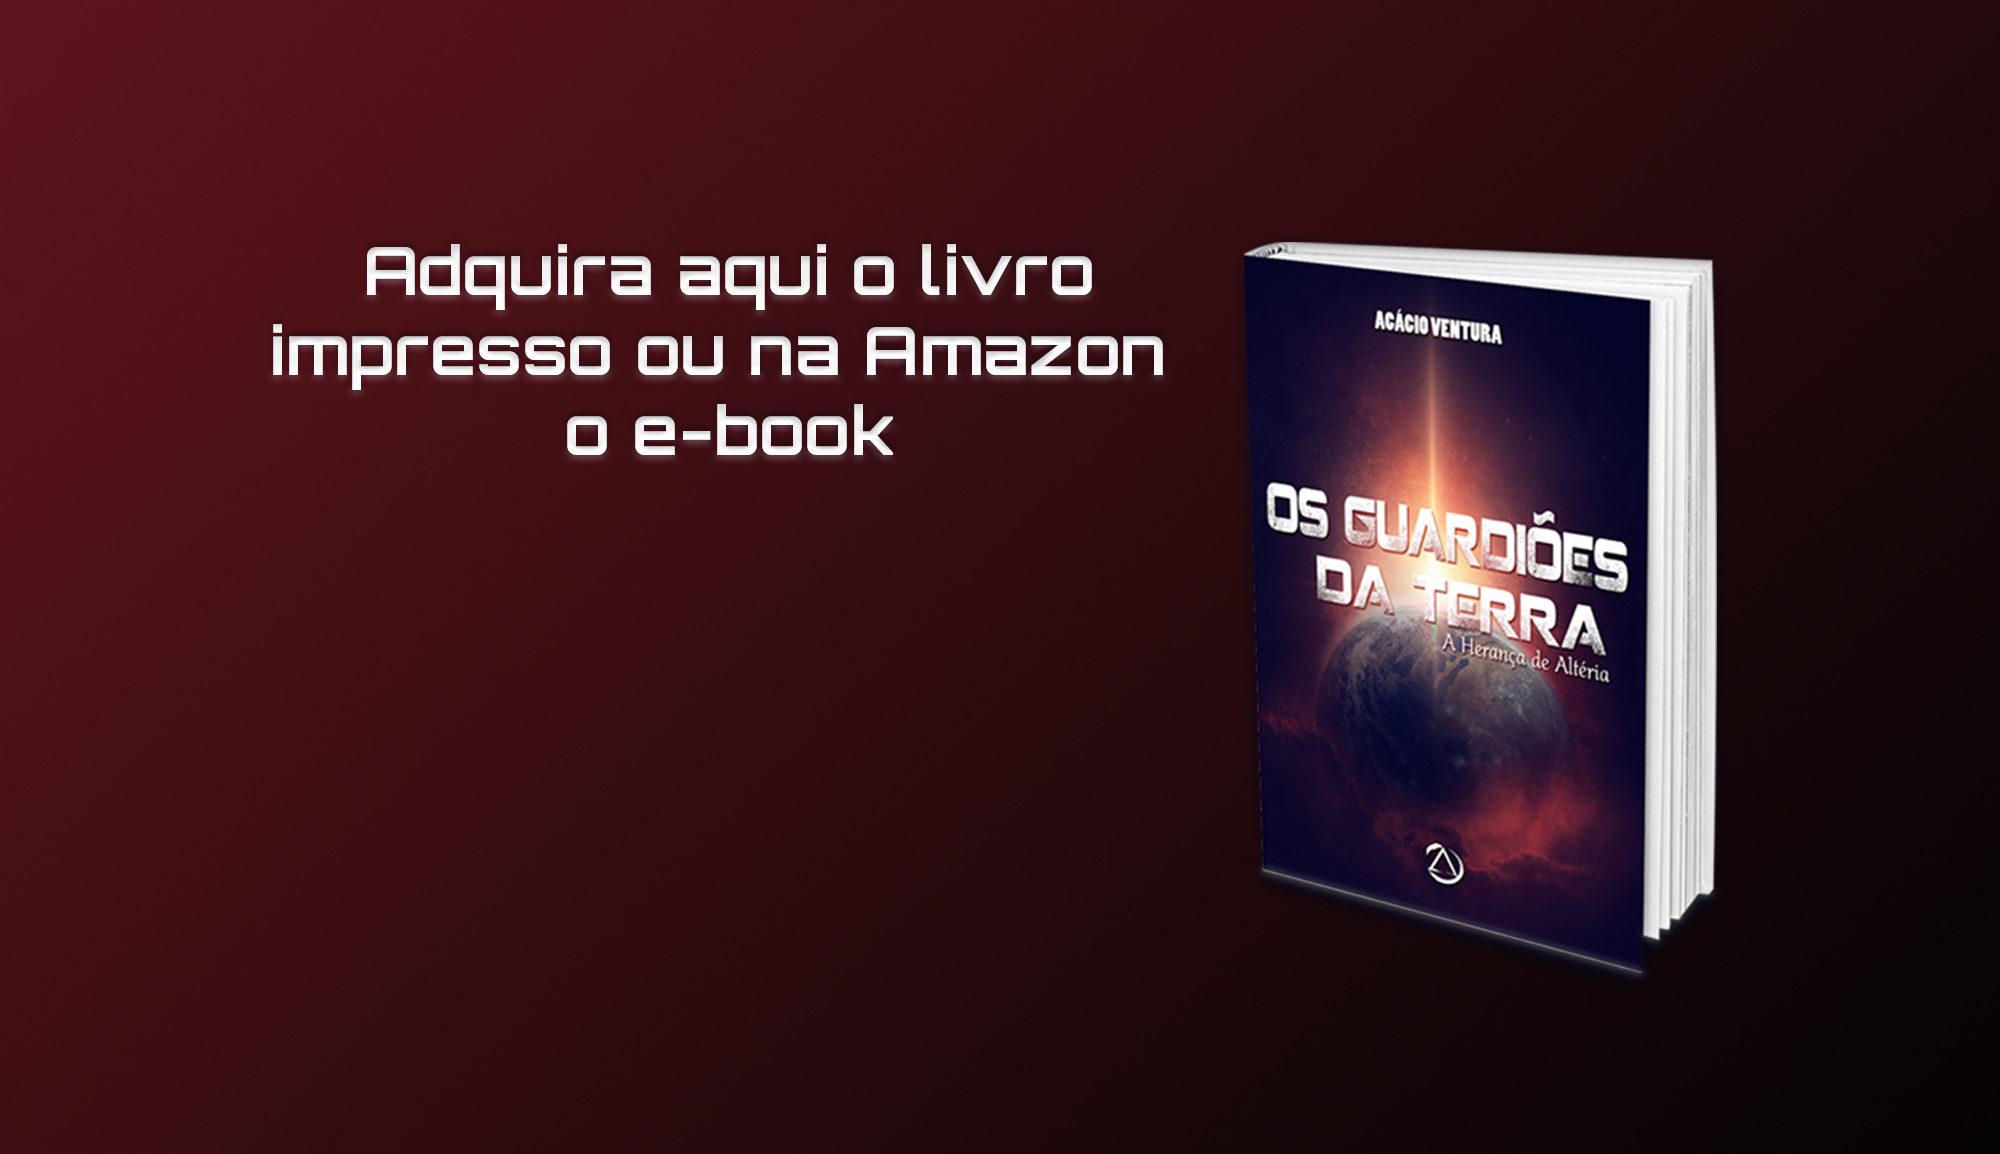 Blog Acácio Ventura